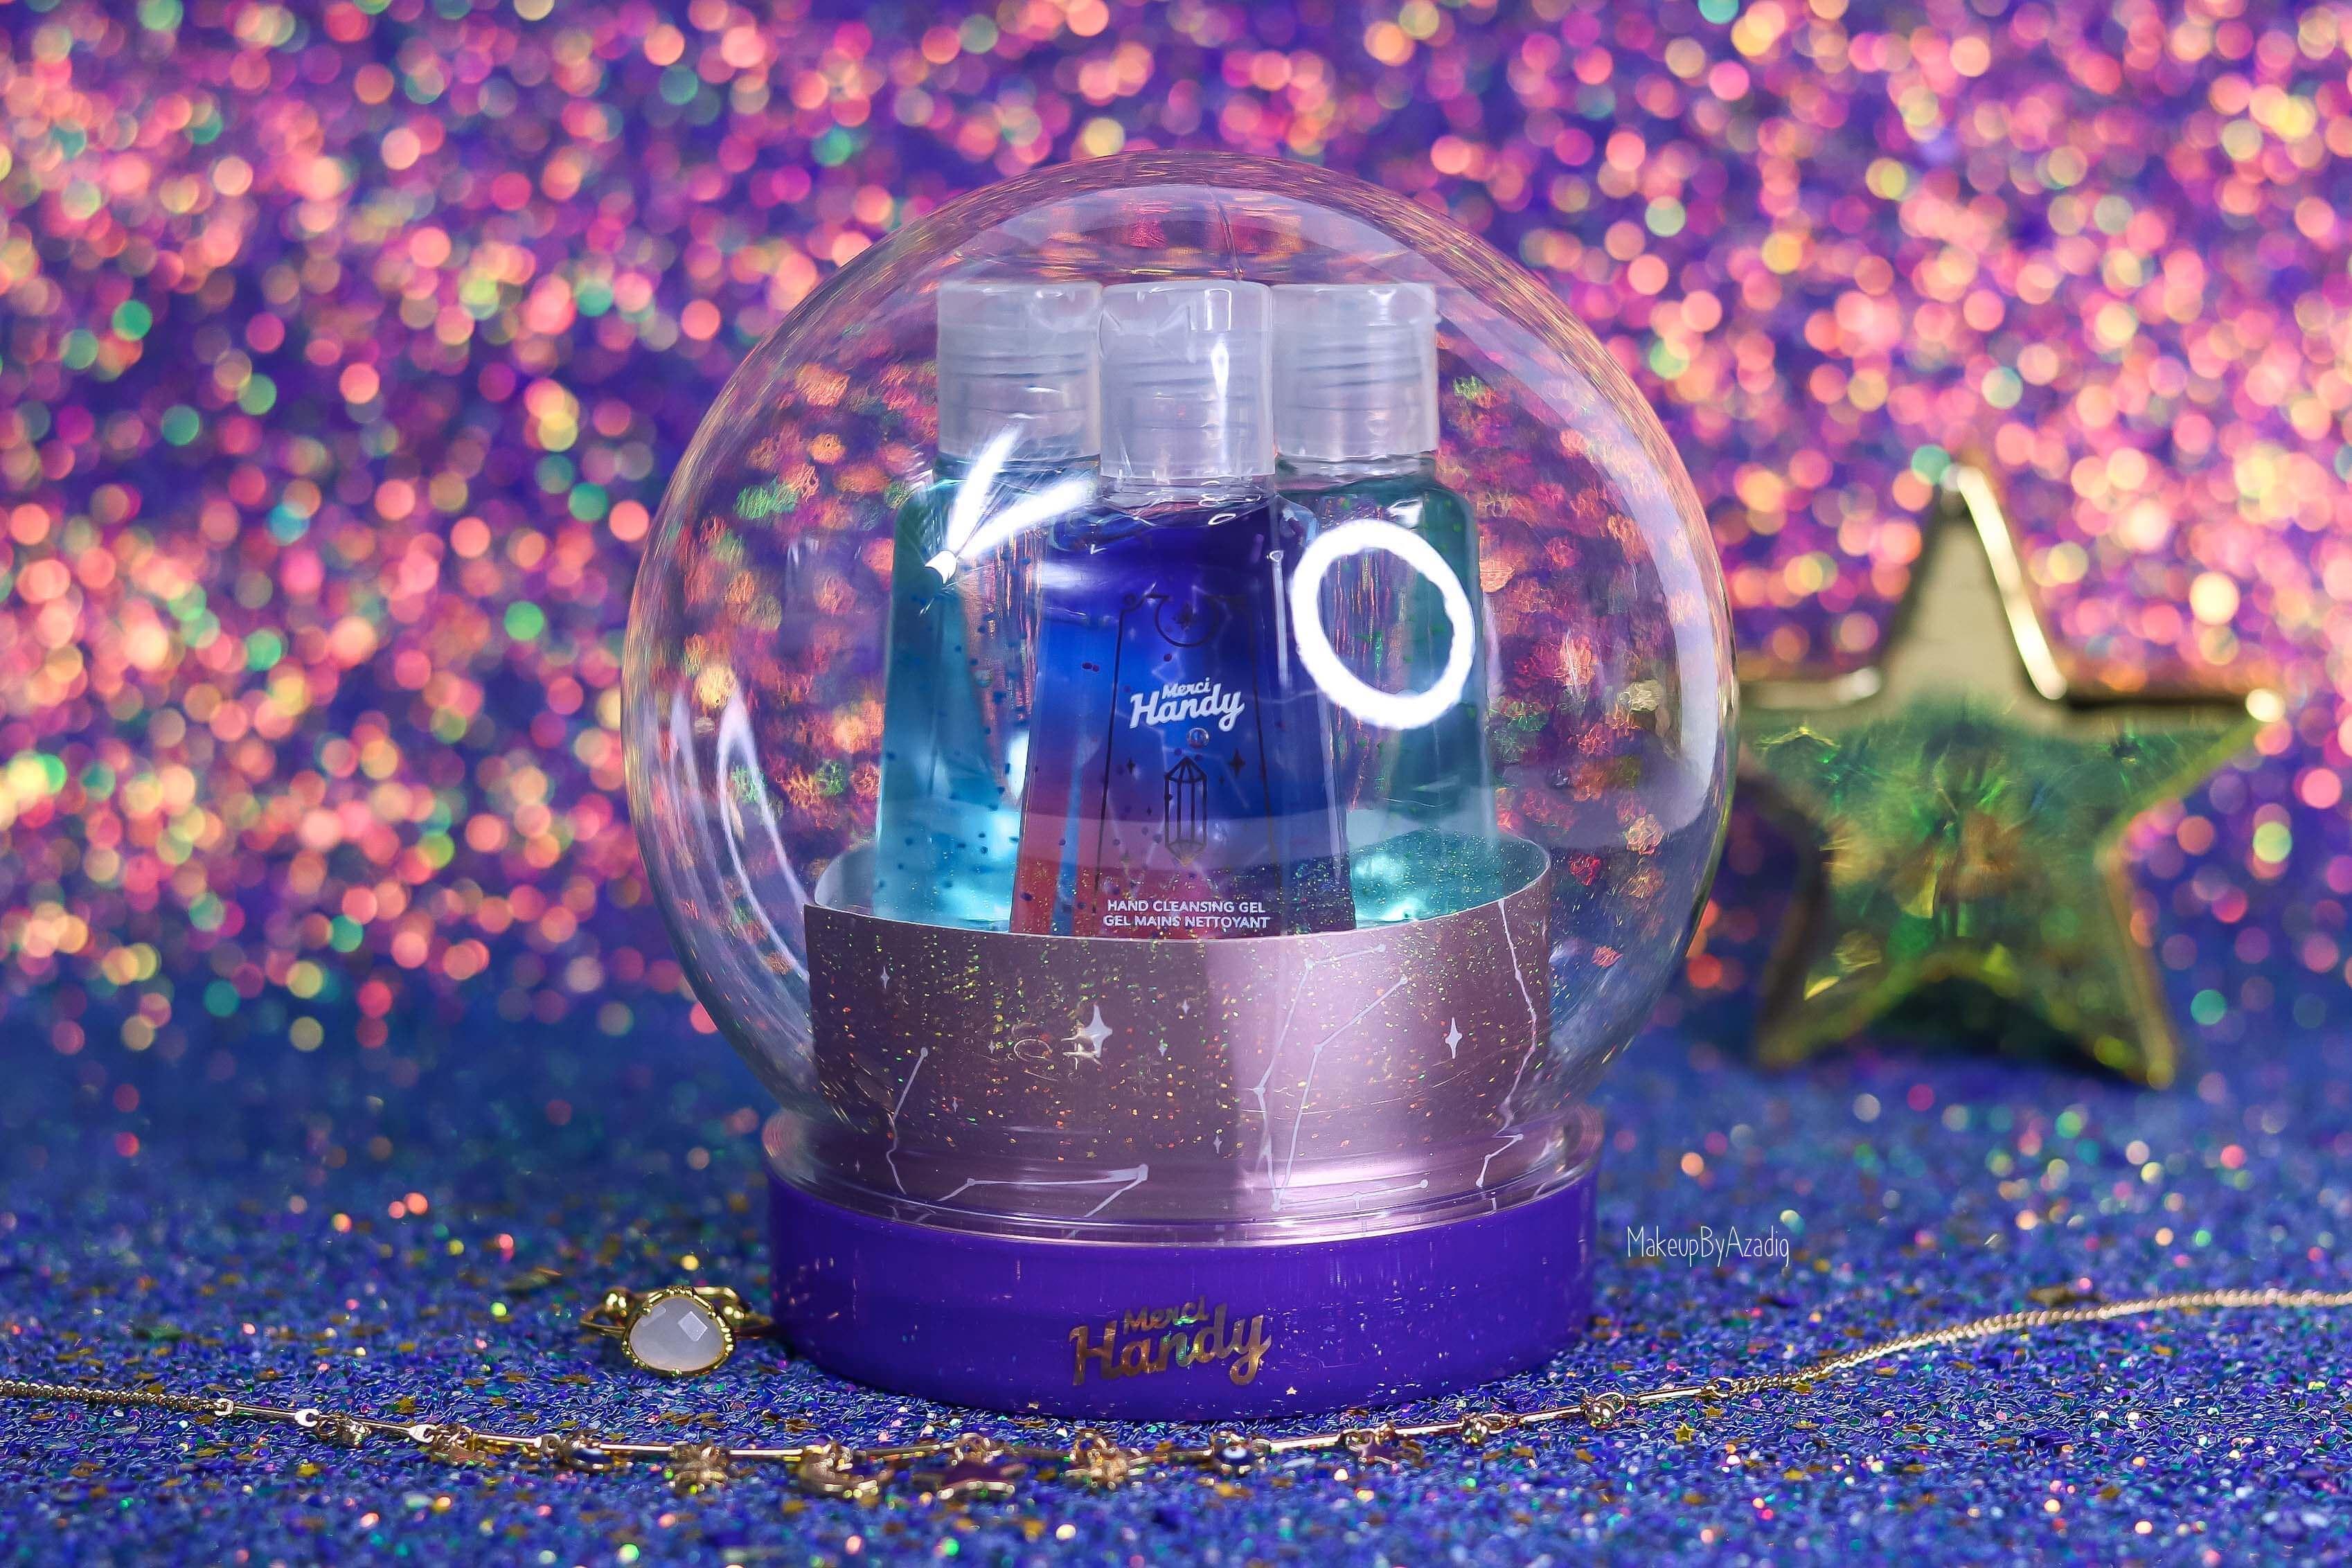 revue-coffret-collection-gel-antibacteriens-merci-handy-crystal-ball-mystique-makeupbyazadig-new-avis-prix-senteur-sephora-france-boule-de-cristal